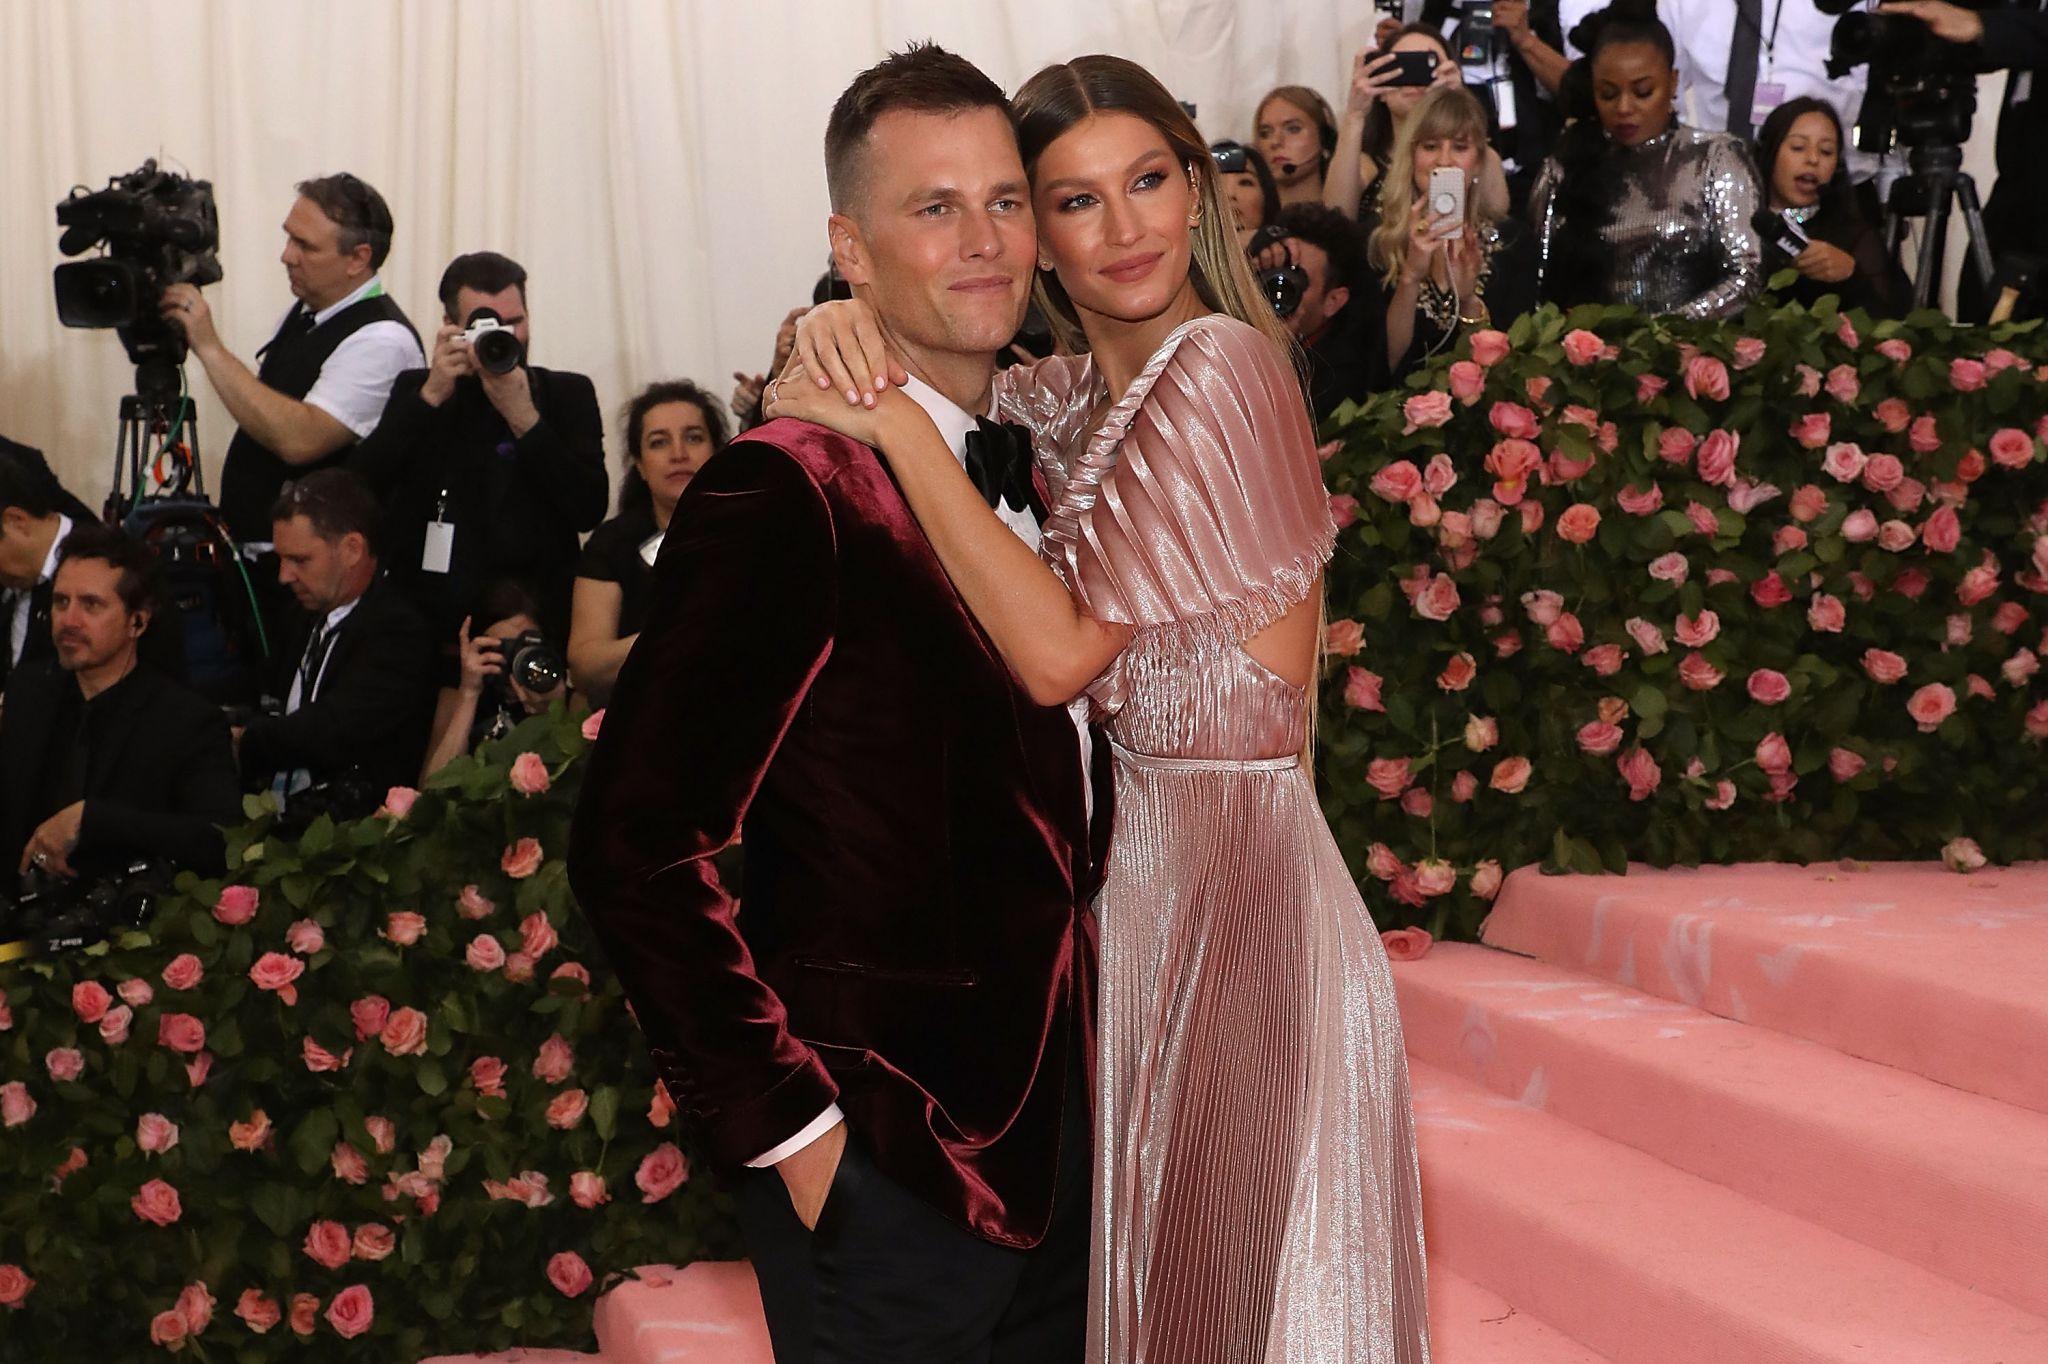 Report: Tom Brady, Gisele Bündchen move into Greenwich home